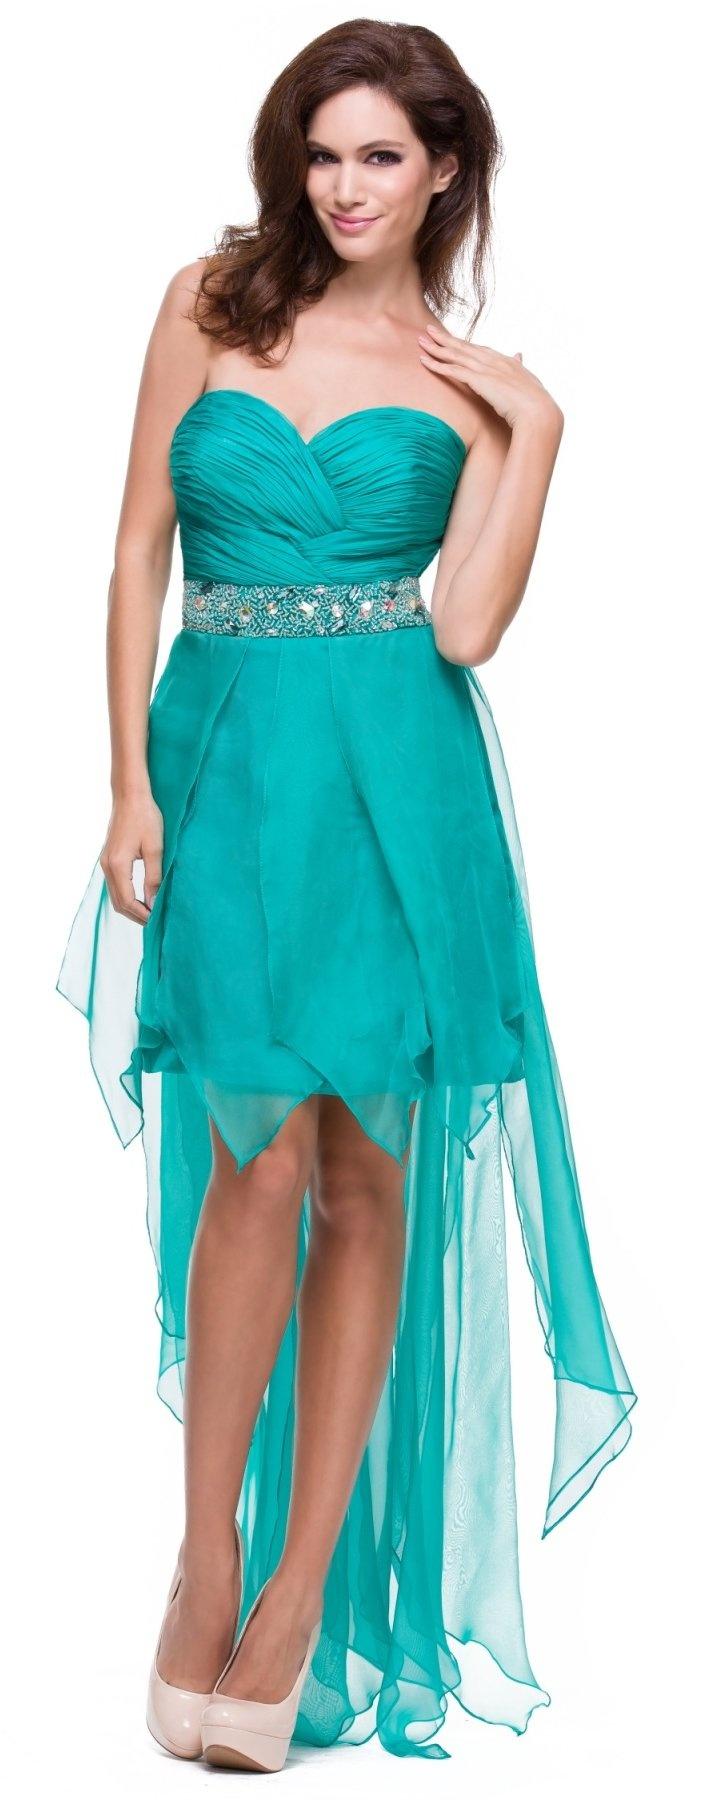 27 best Prom dresses images on Pinterest | Party wear dresses ...